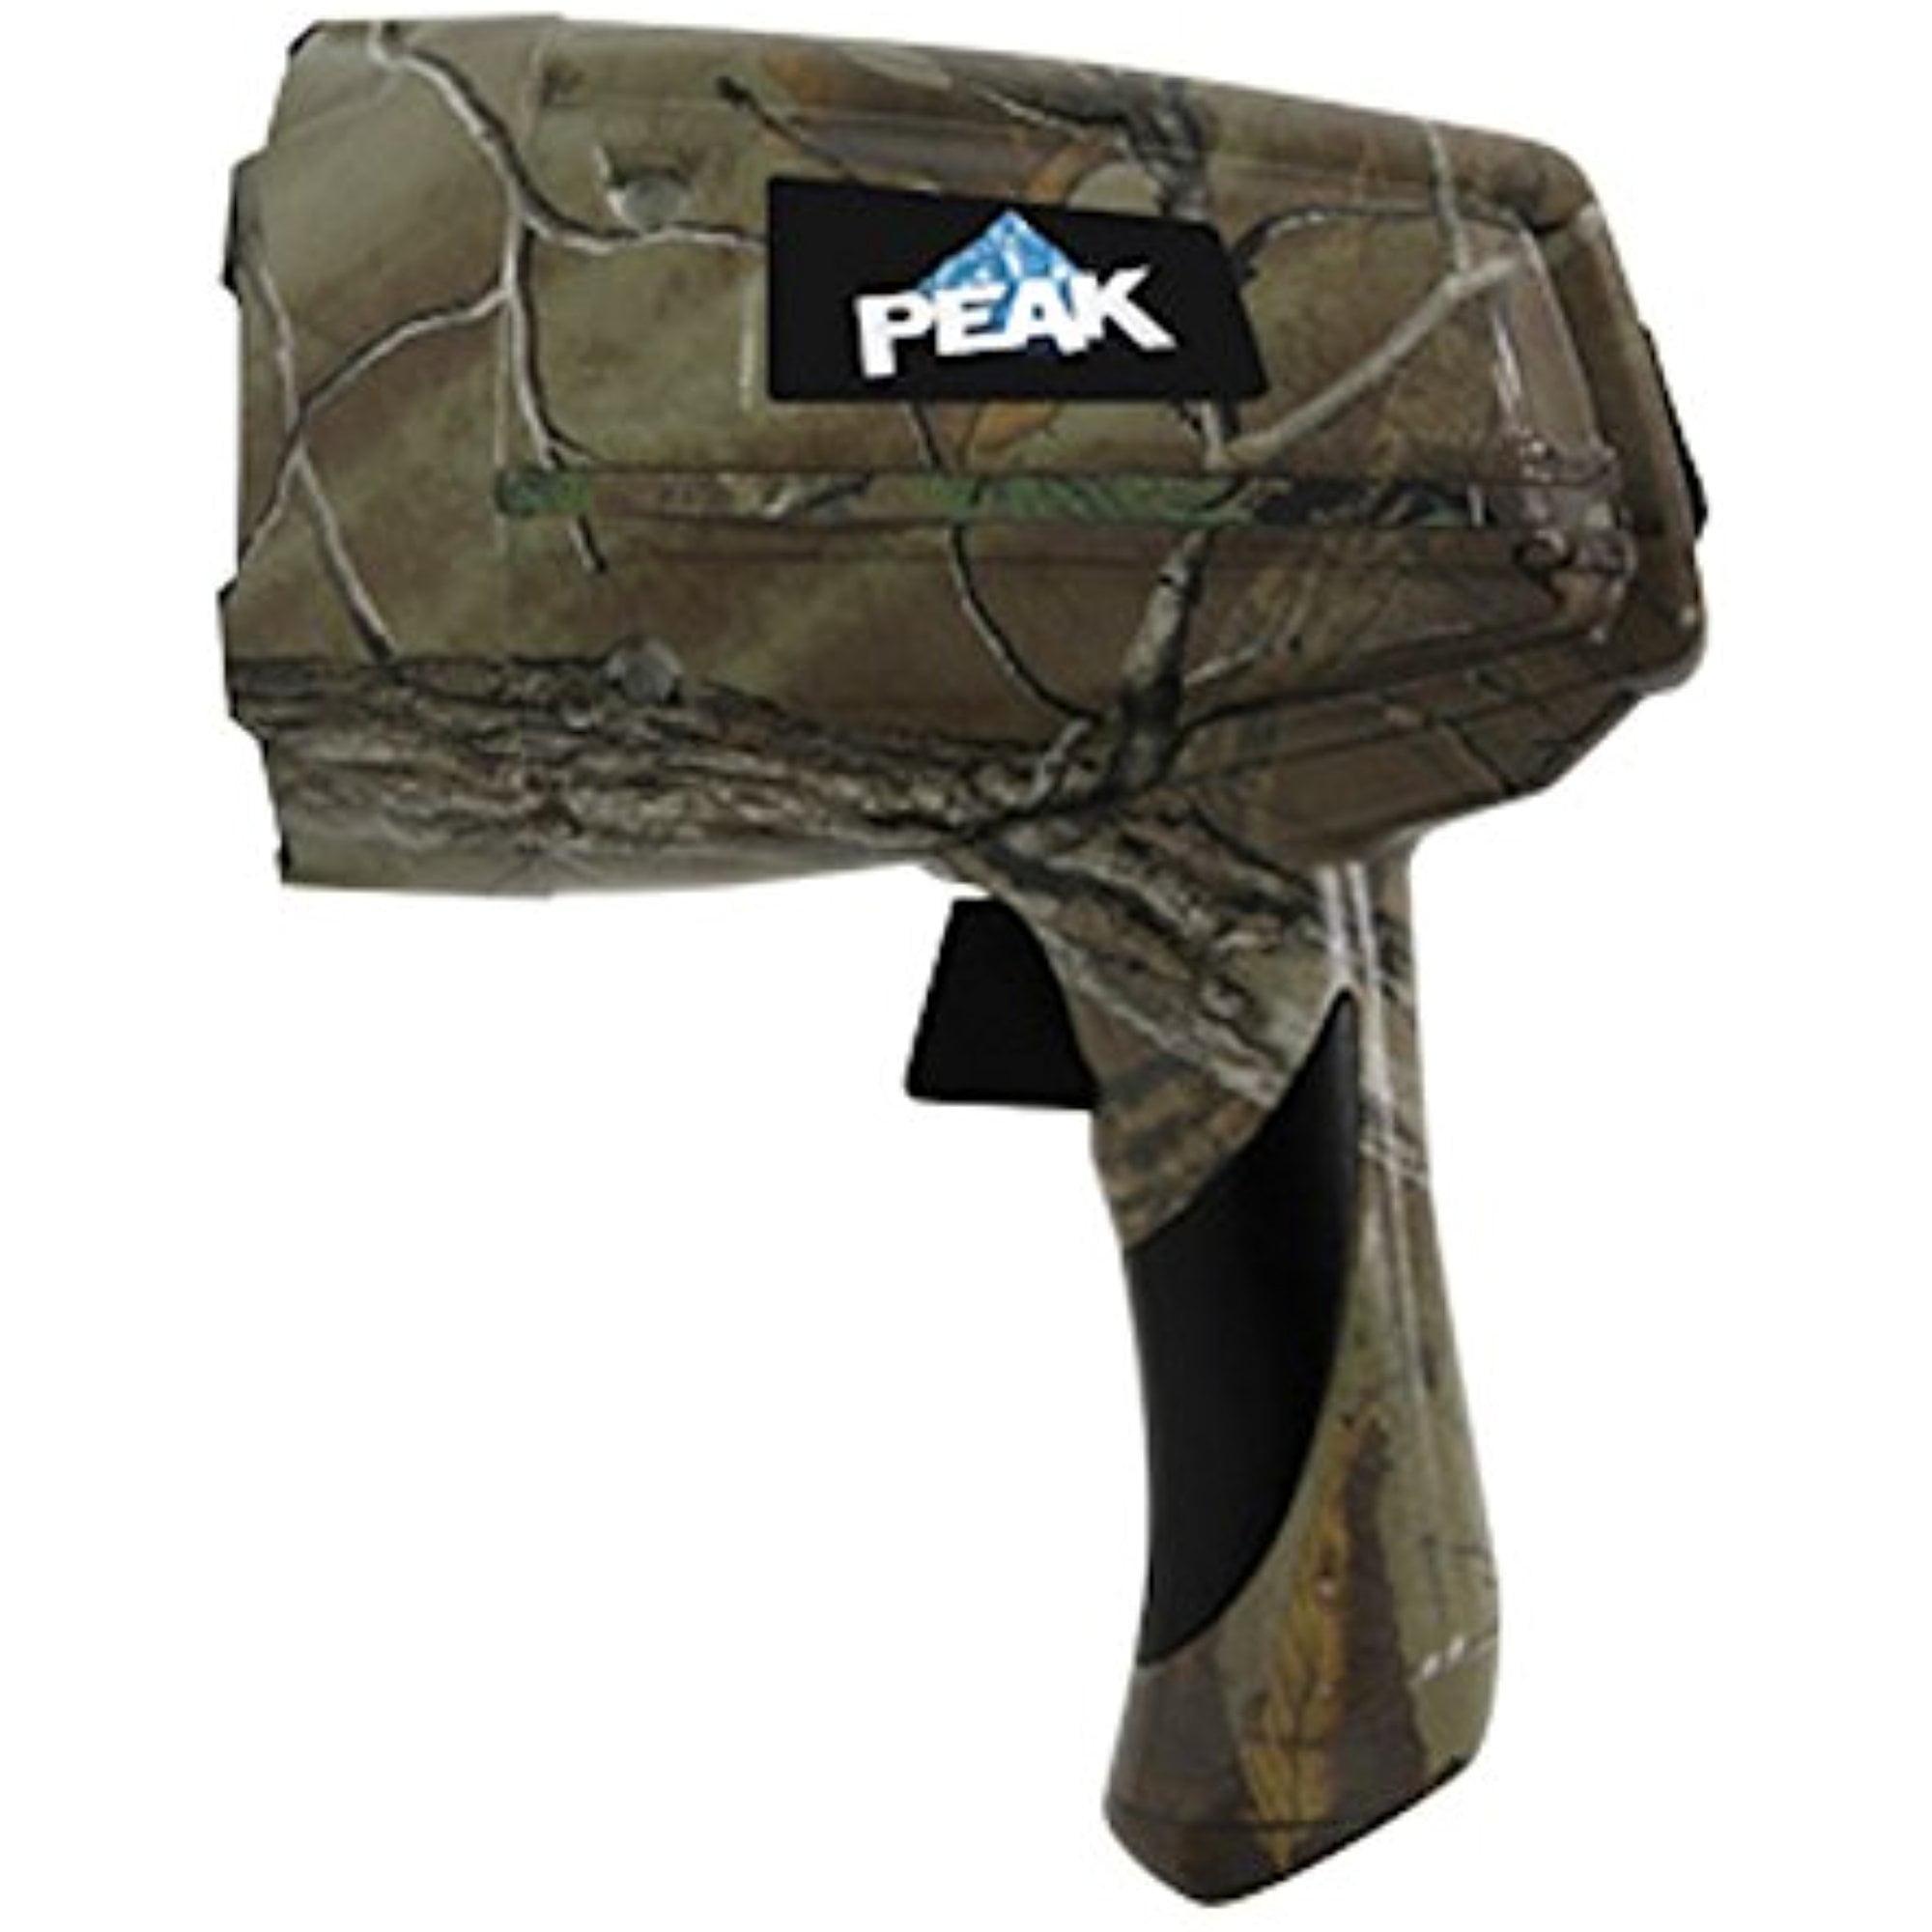 Peak PKC0T3C Camo Spotlight by Peak Auto